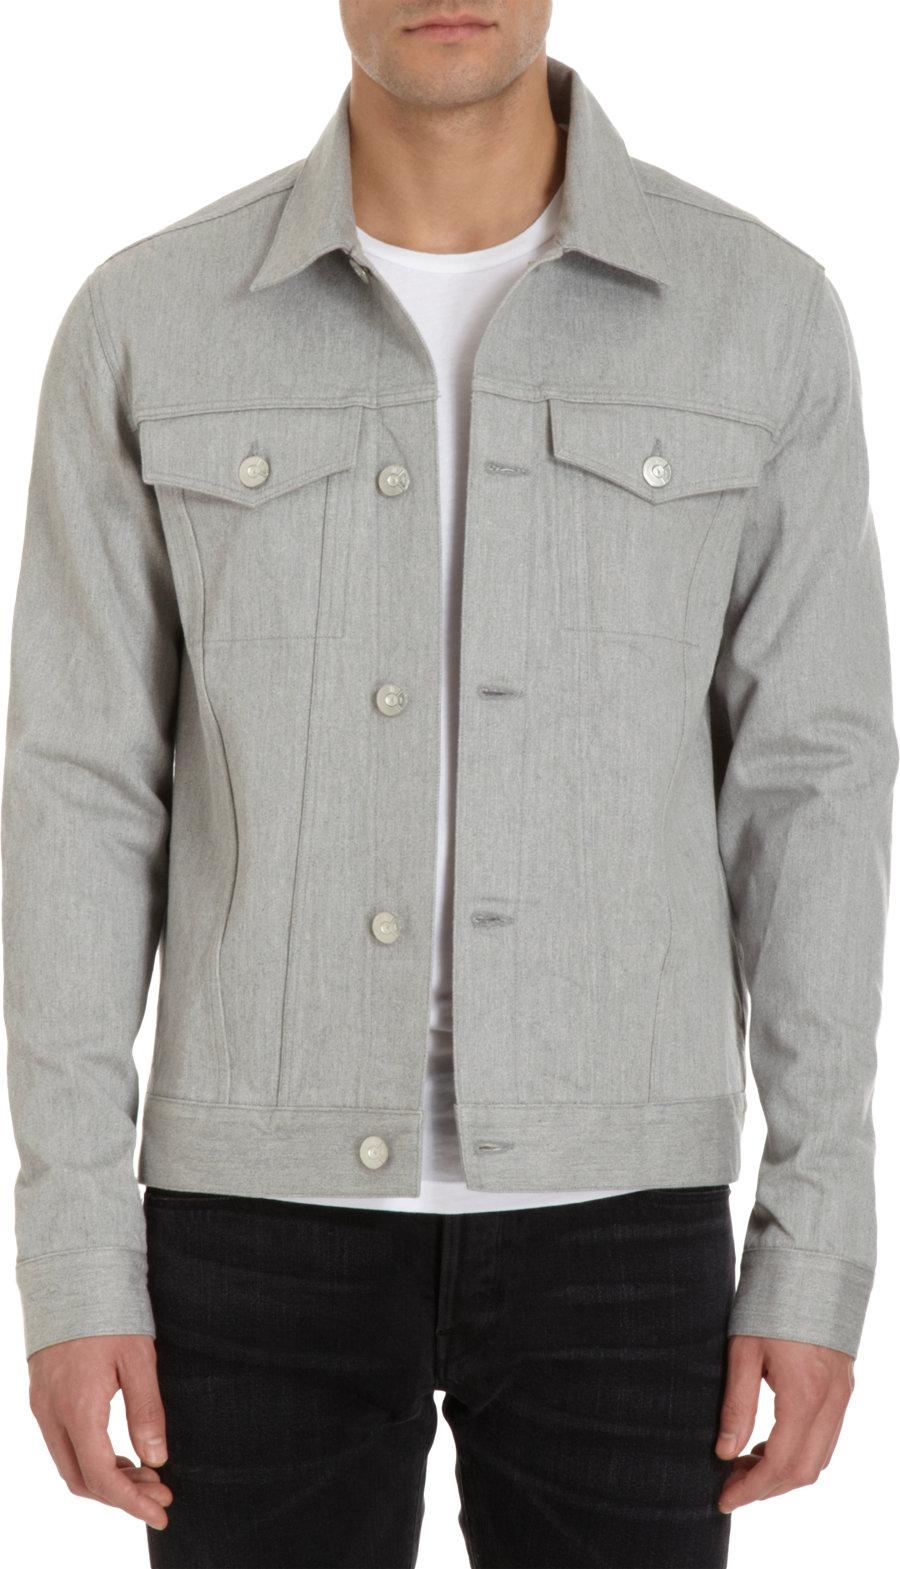 Mens Gray Denim Jacket - JacketIn